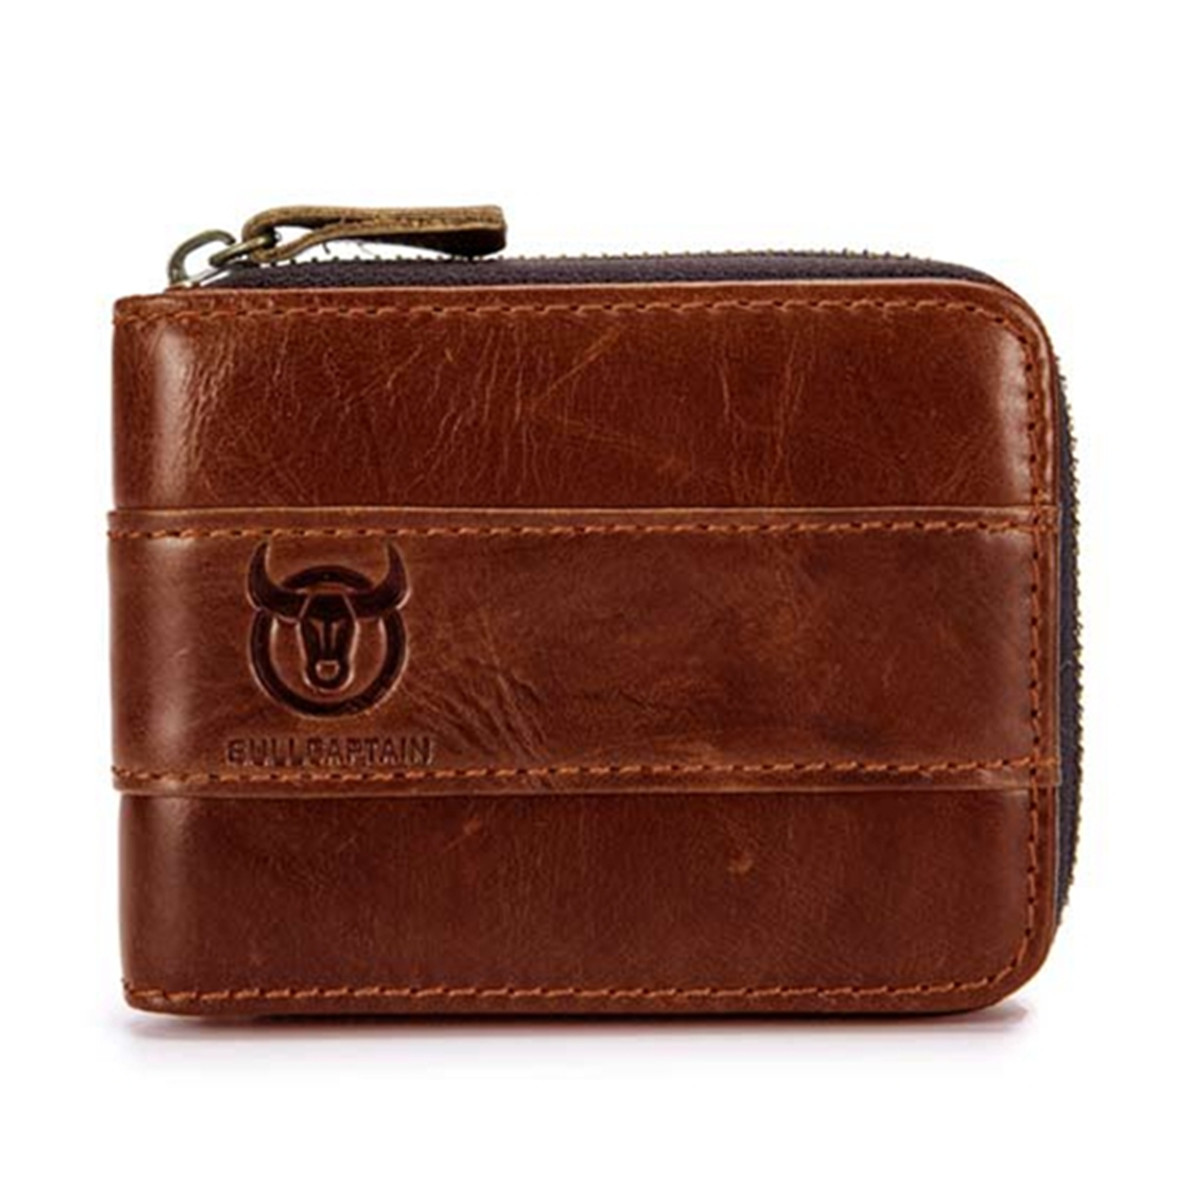 RFID-Men-Genuine-Leather-Card-Slots-Coin-Wallet-